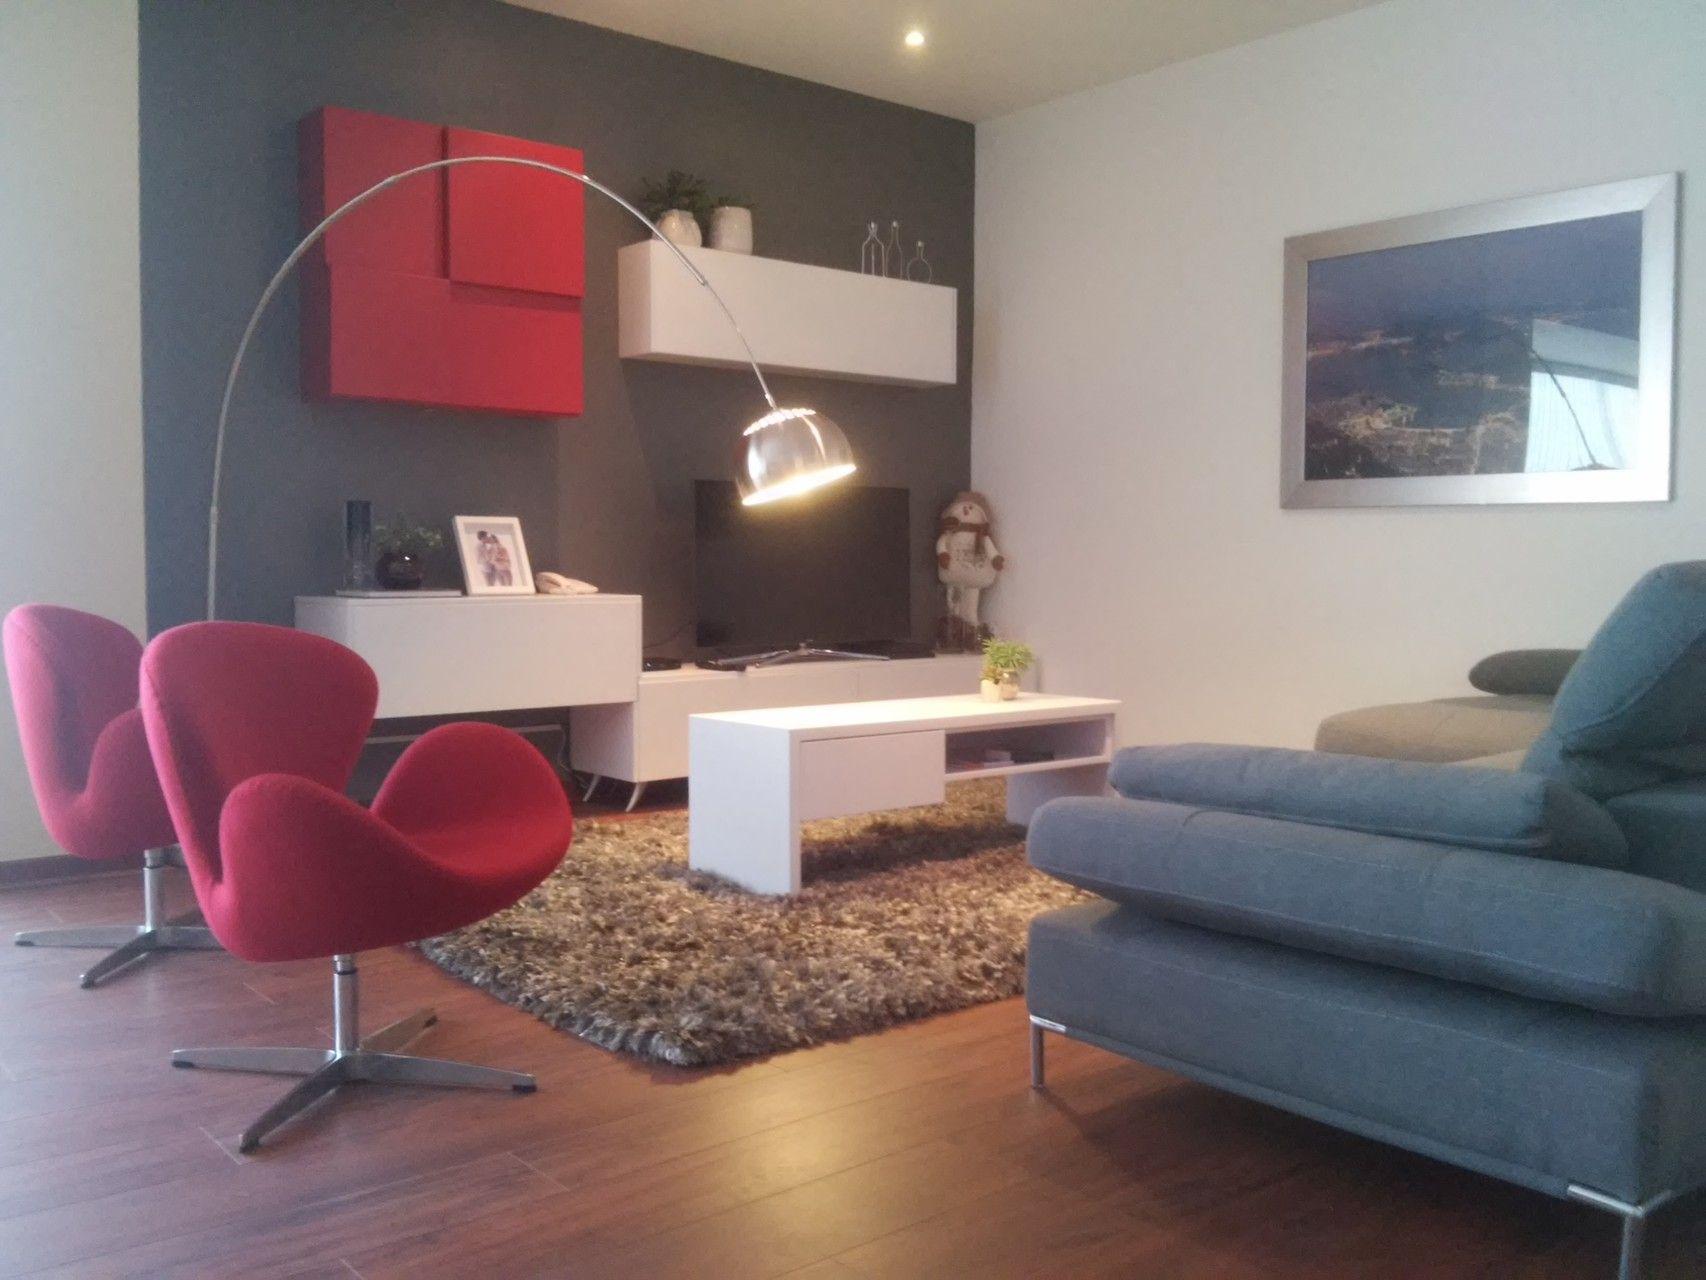 Decoracion interiores pisos pequeos top amazing with - Decoracion de interiores pequenos ...